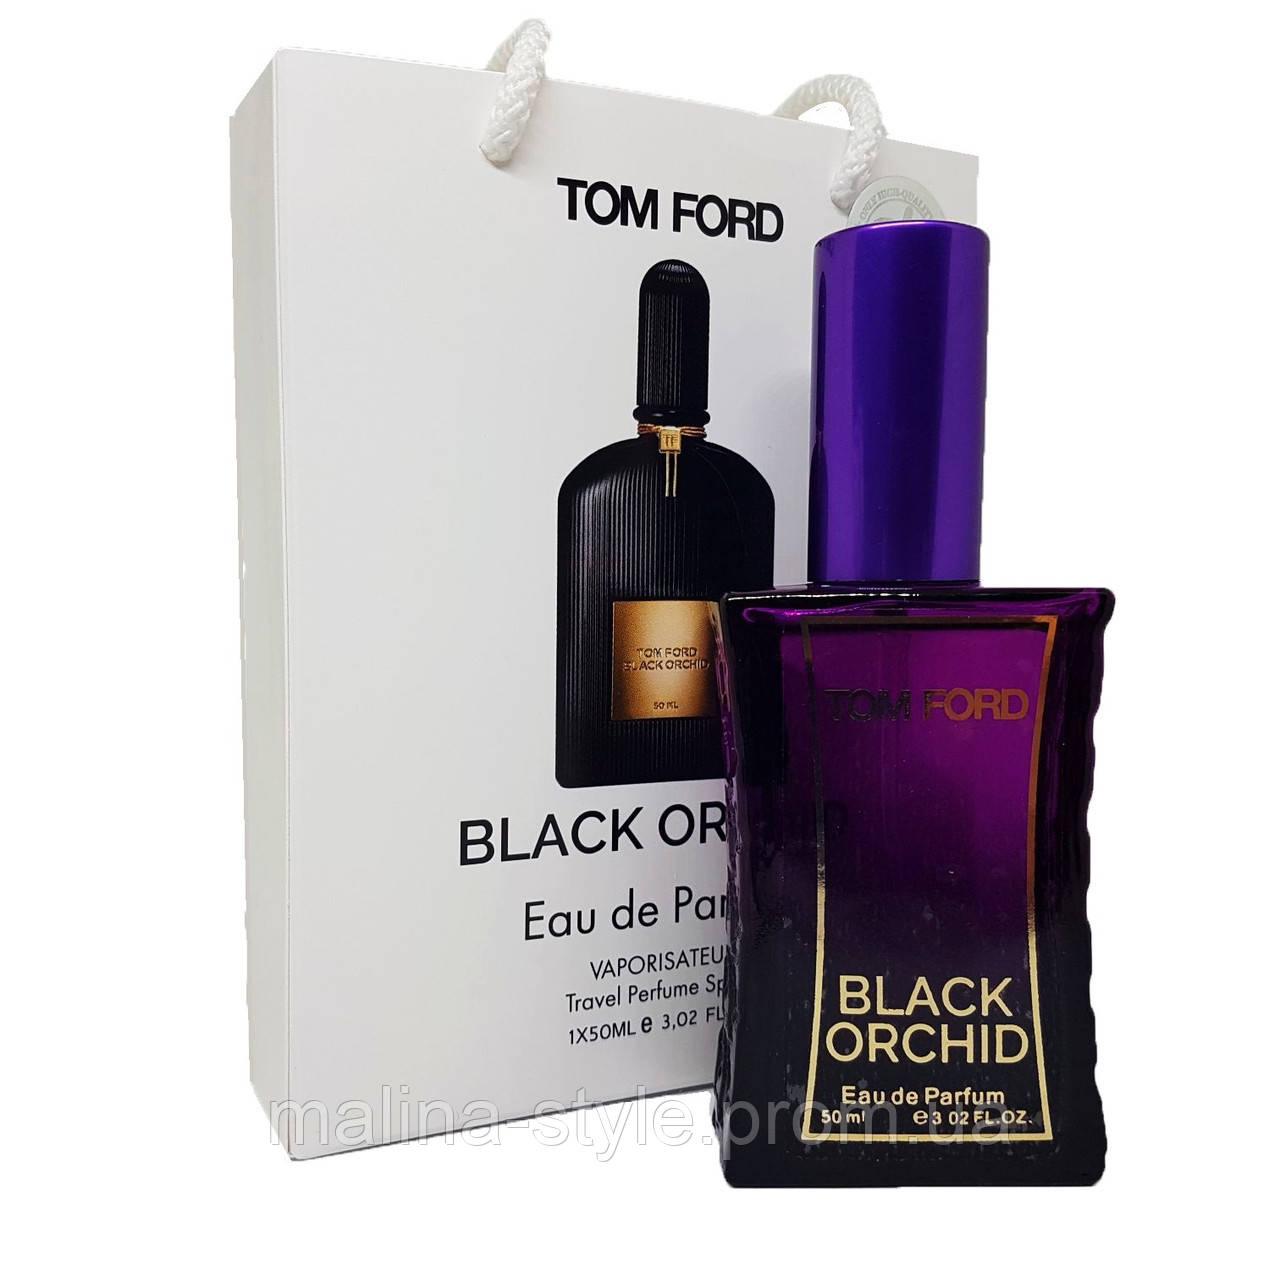 Tom Ford Black Orchid Travel Perfume 50ml цена 72 грн купить в